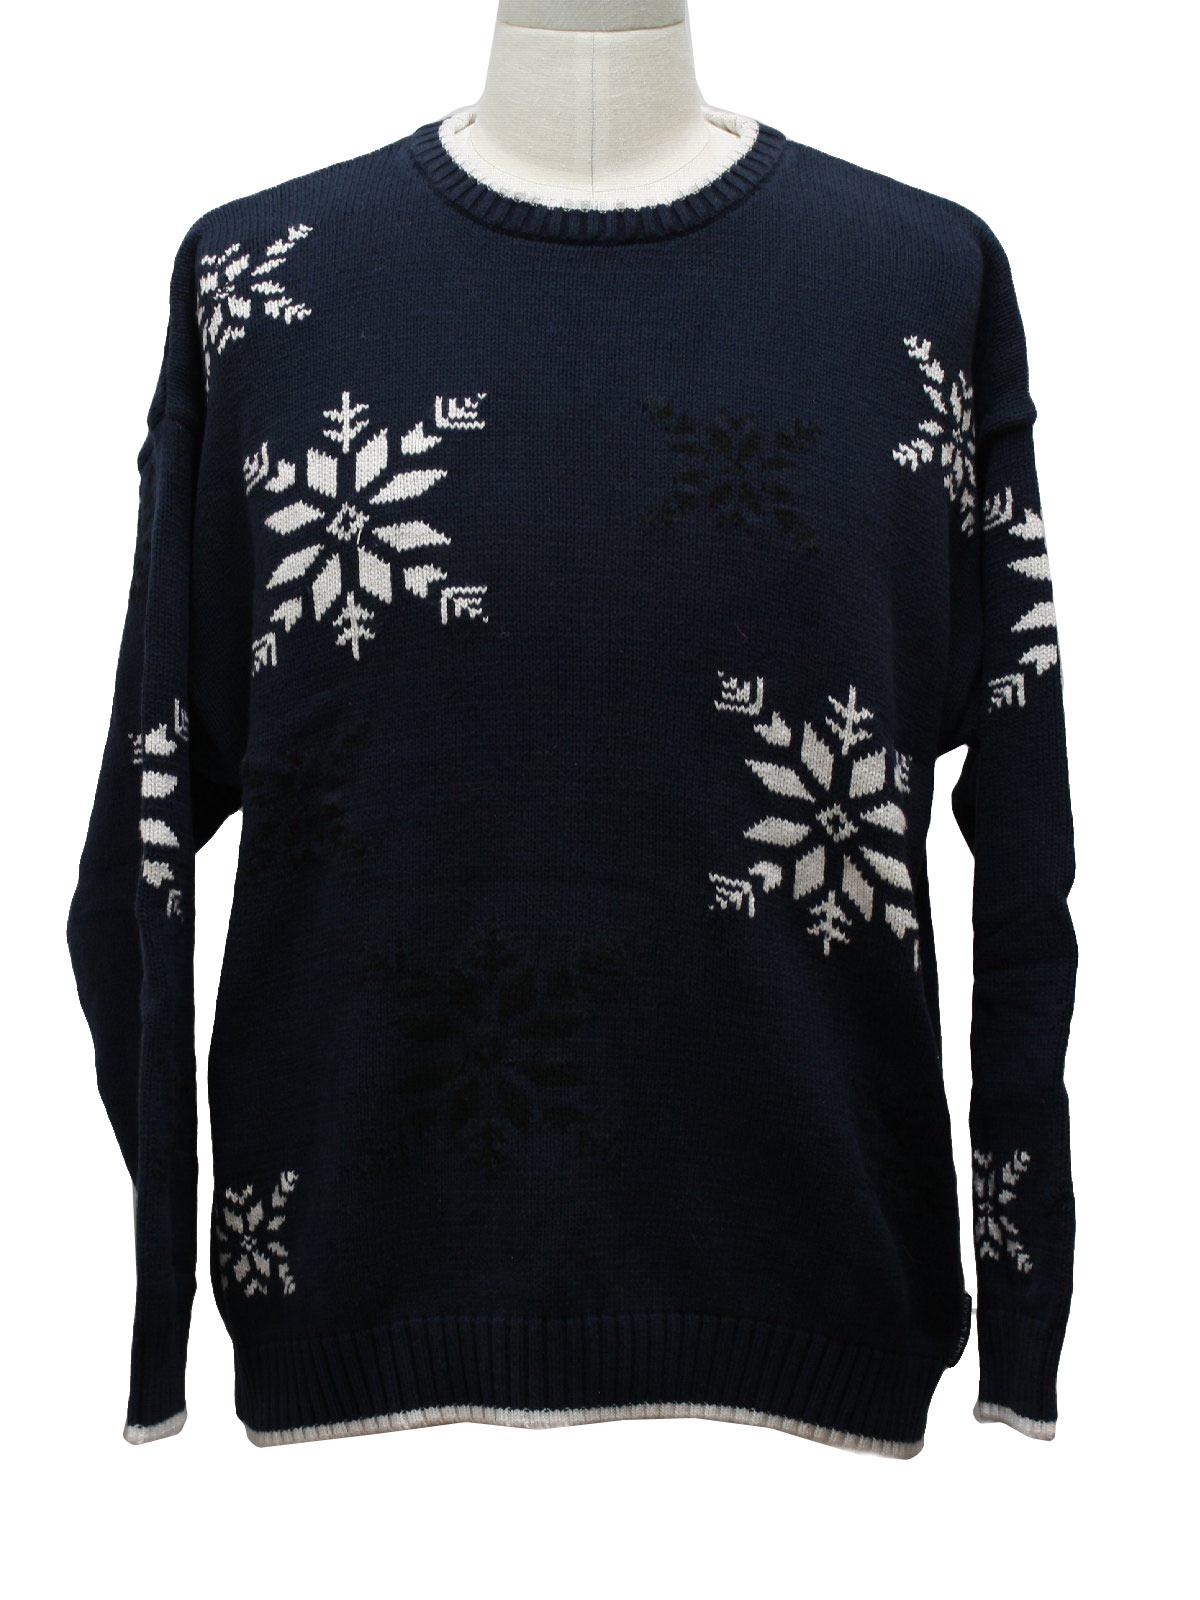 Mens Ugly Christmas Ski Sweater: -Chaps Ralph Lauren- Mens ...